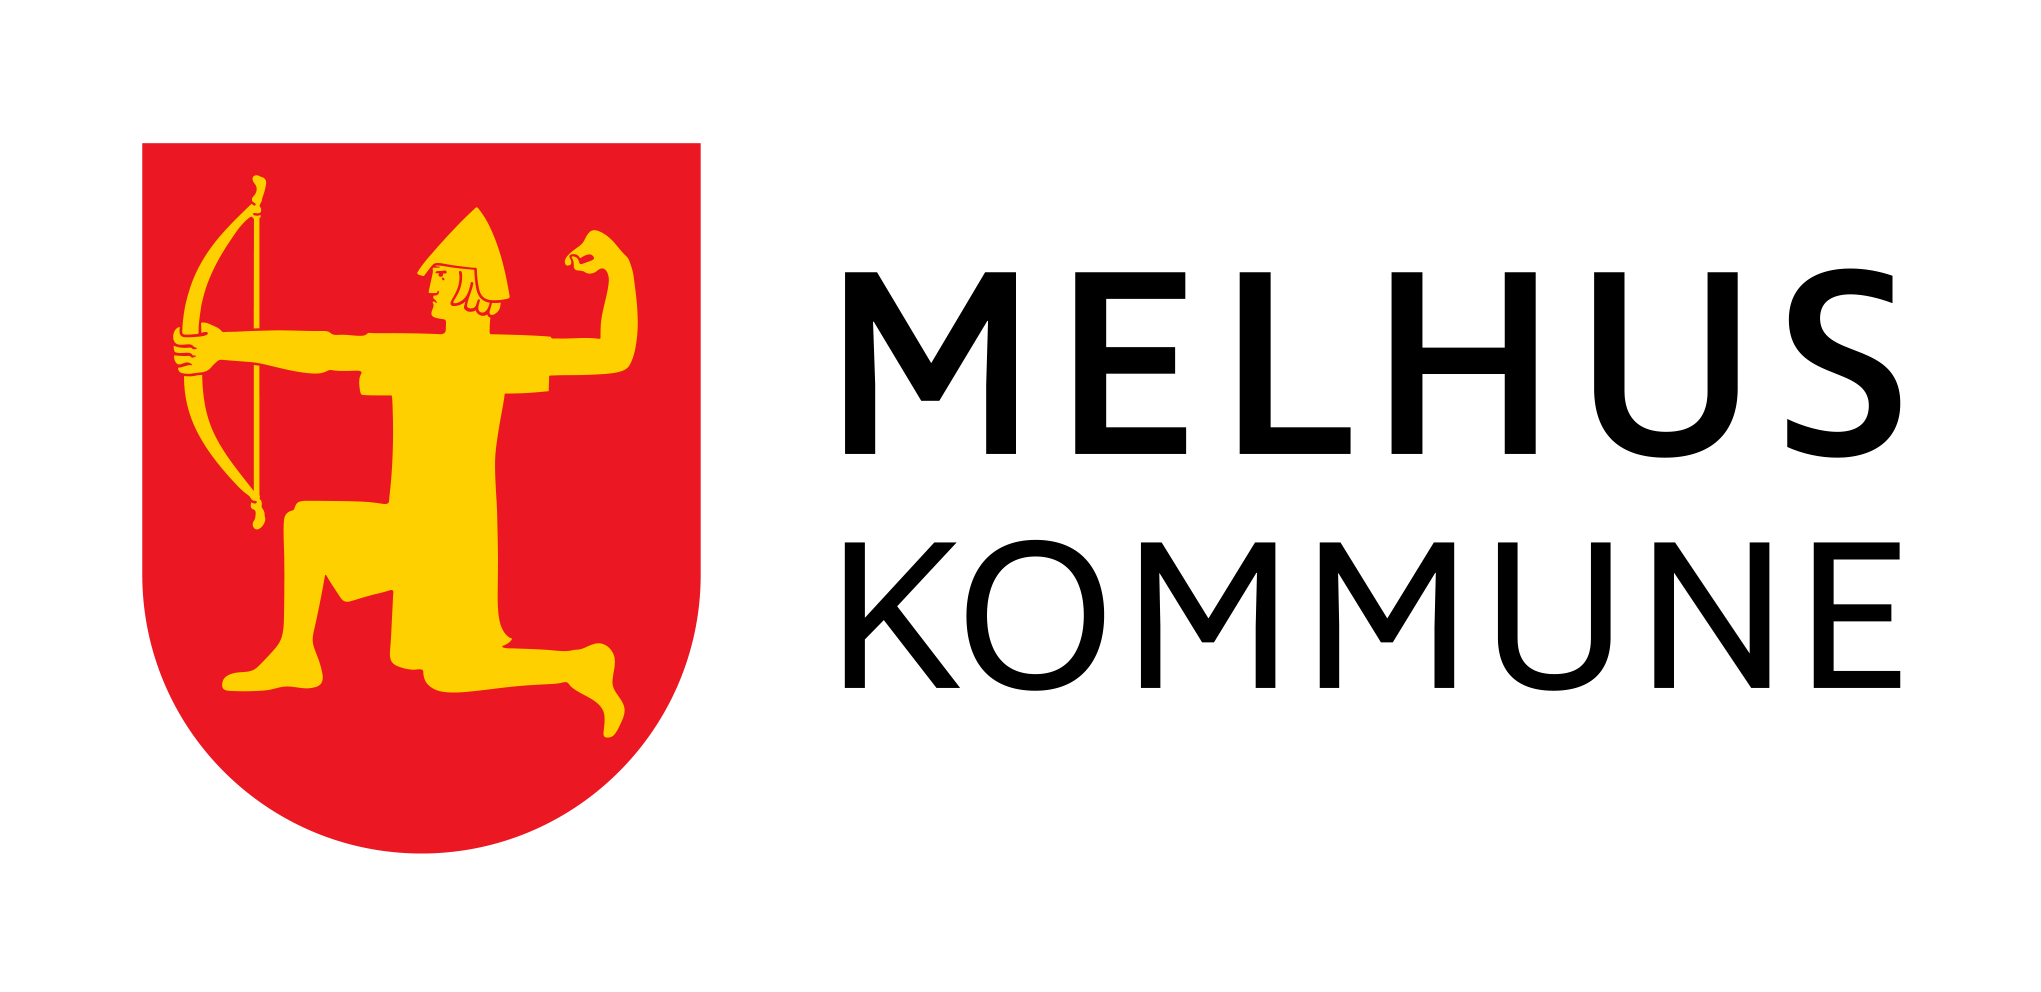 Melhus kommune sitt kommunevåpen